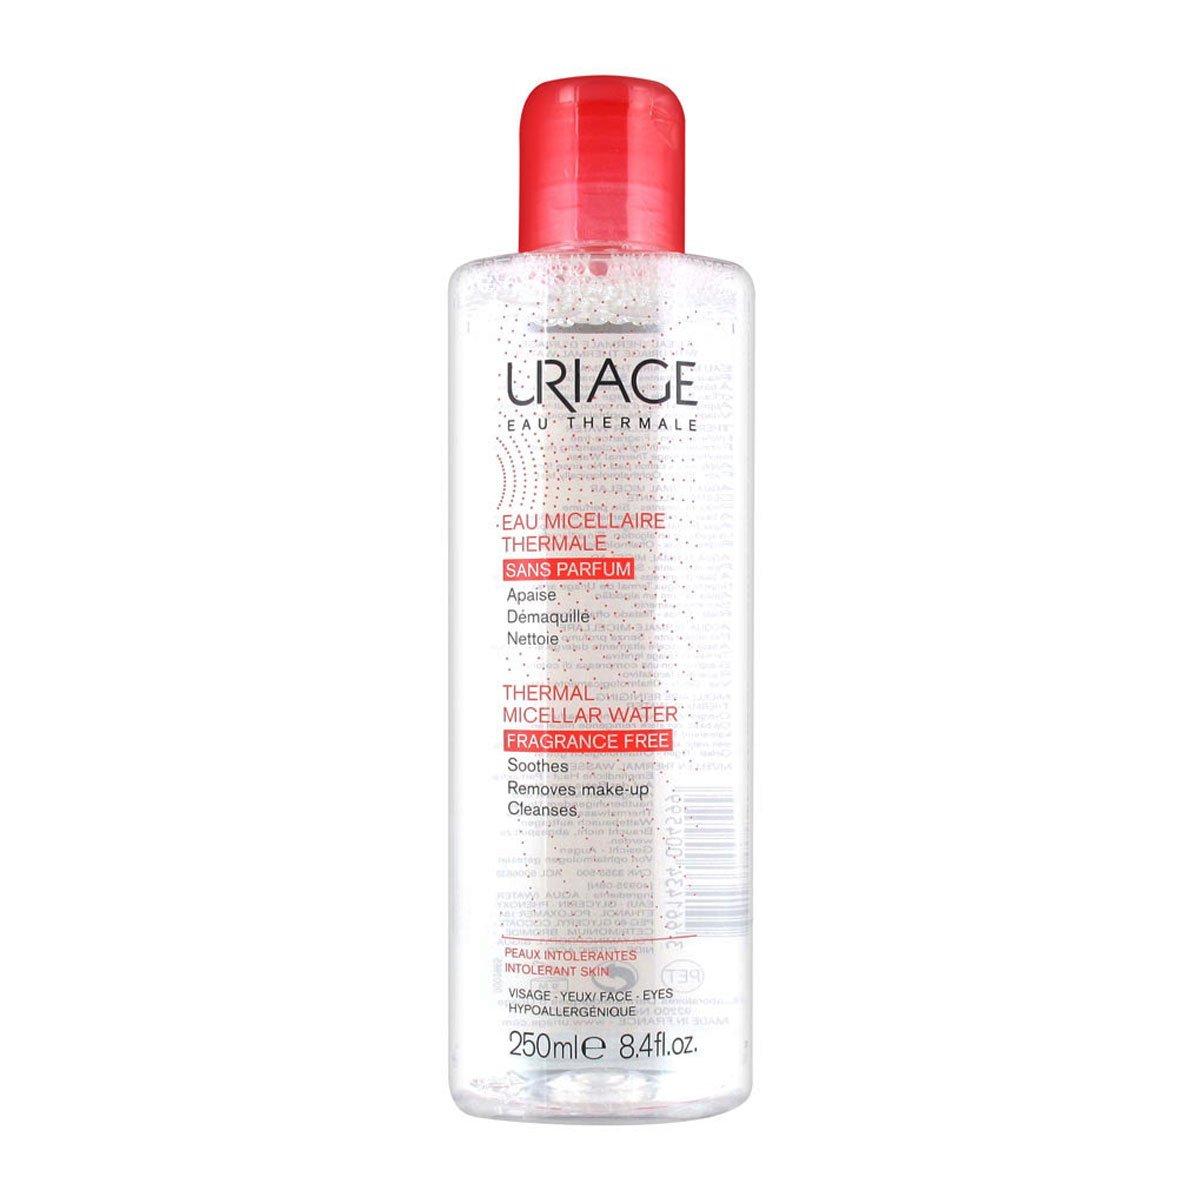 Uriage Eau Micellare Thermale Pi, 250 ml, Pack de 1